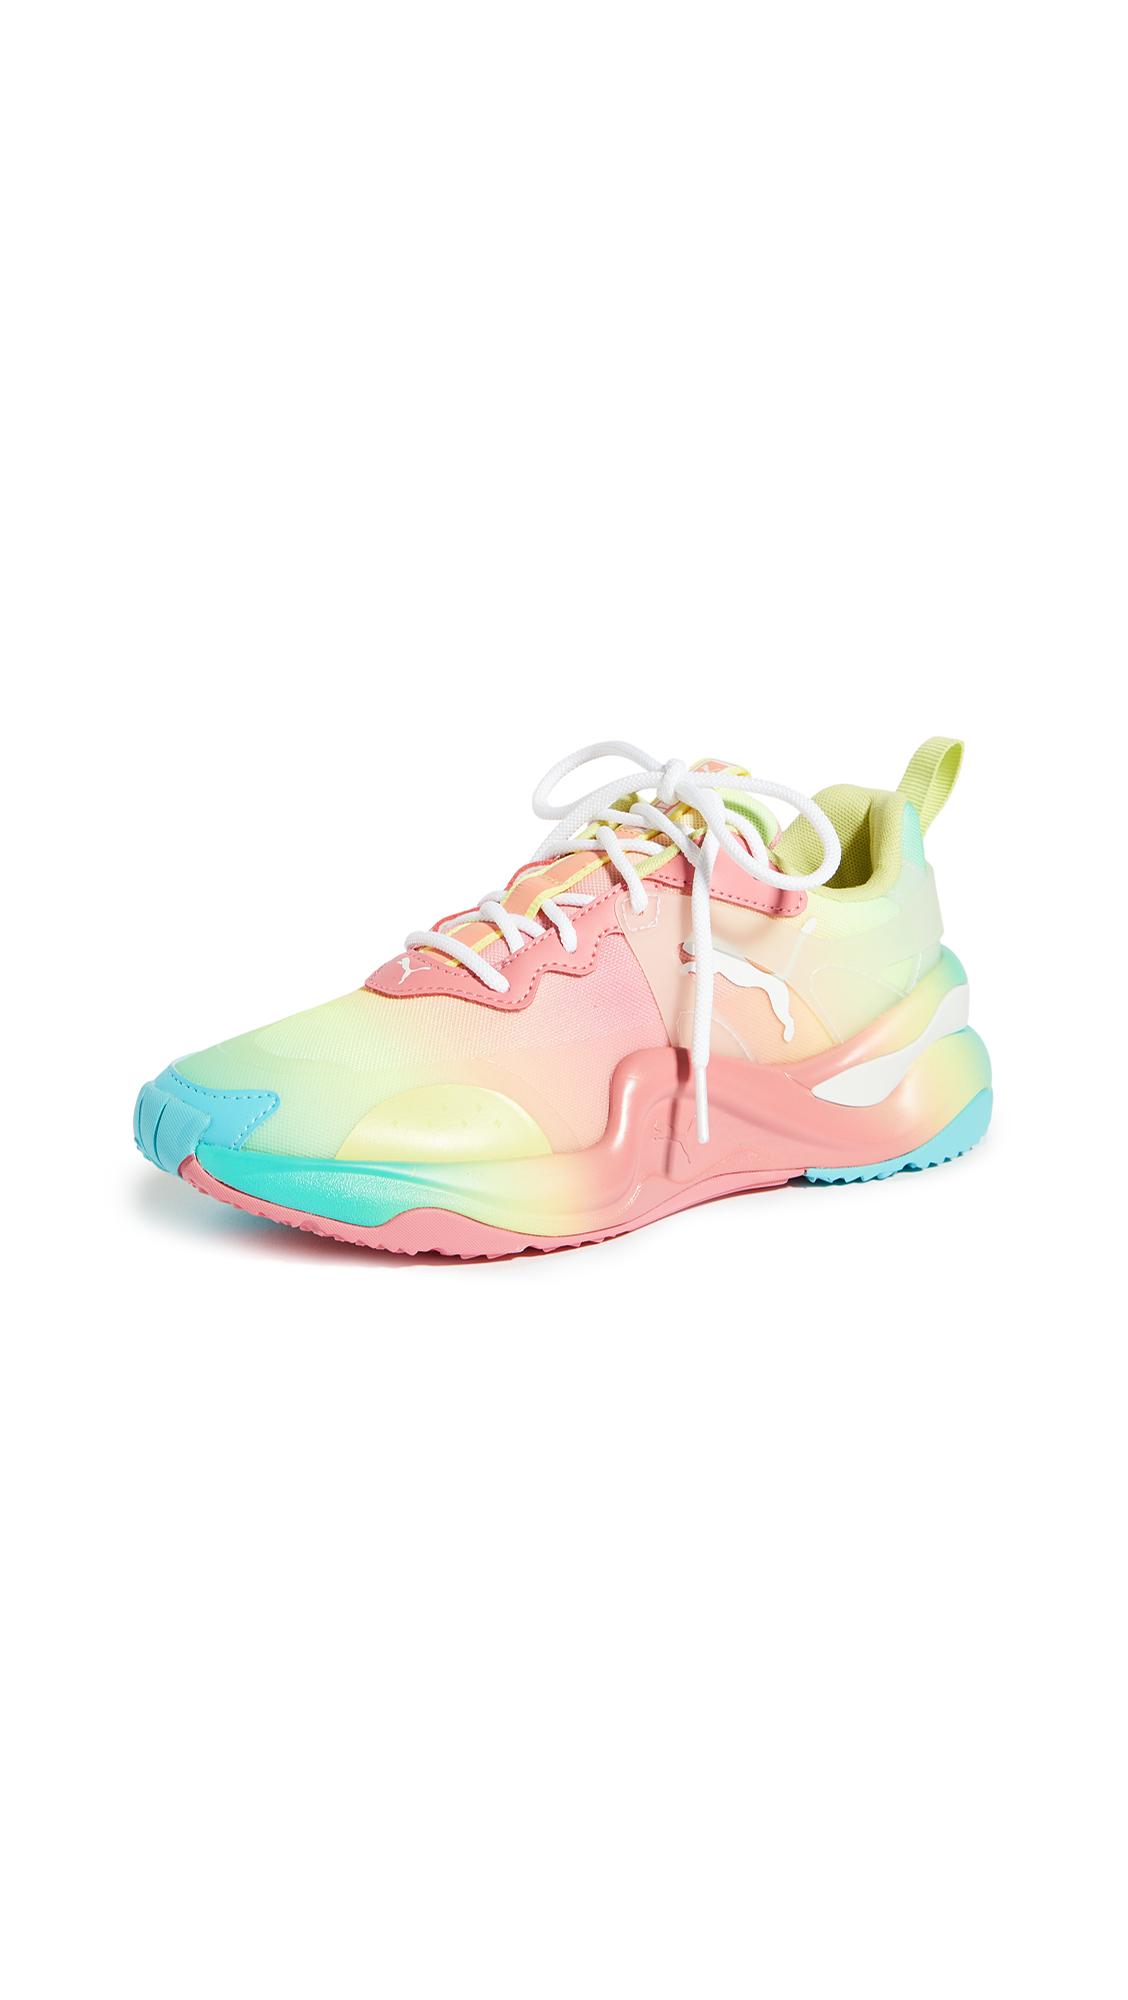 Buy PUMA Rise Tie Dye Sneakers online, shop PUMA